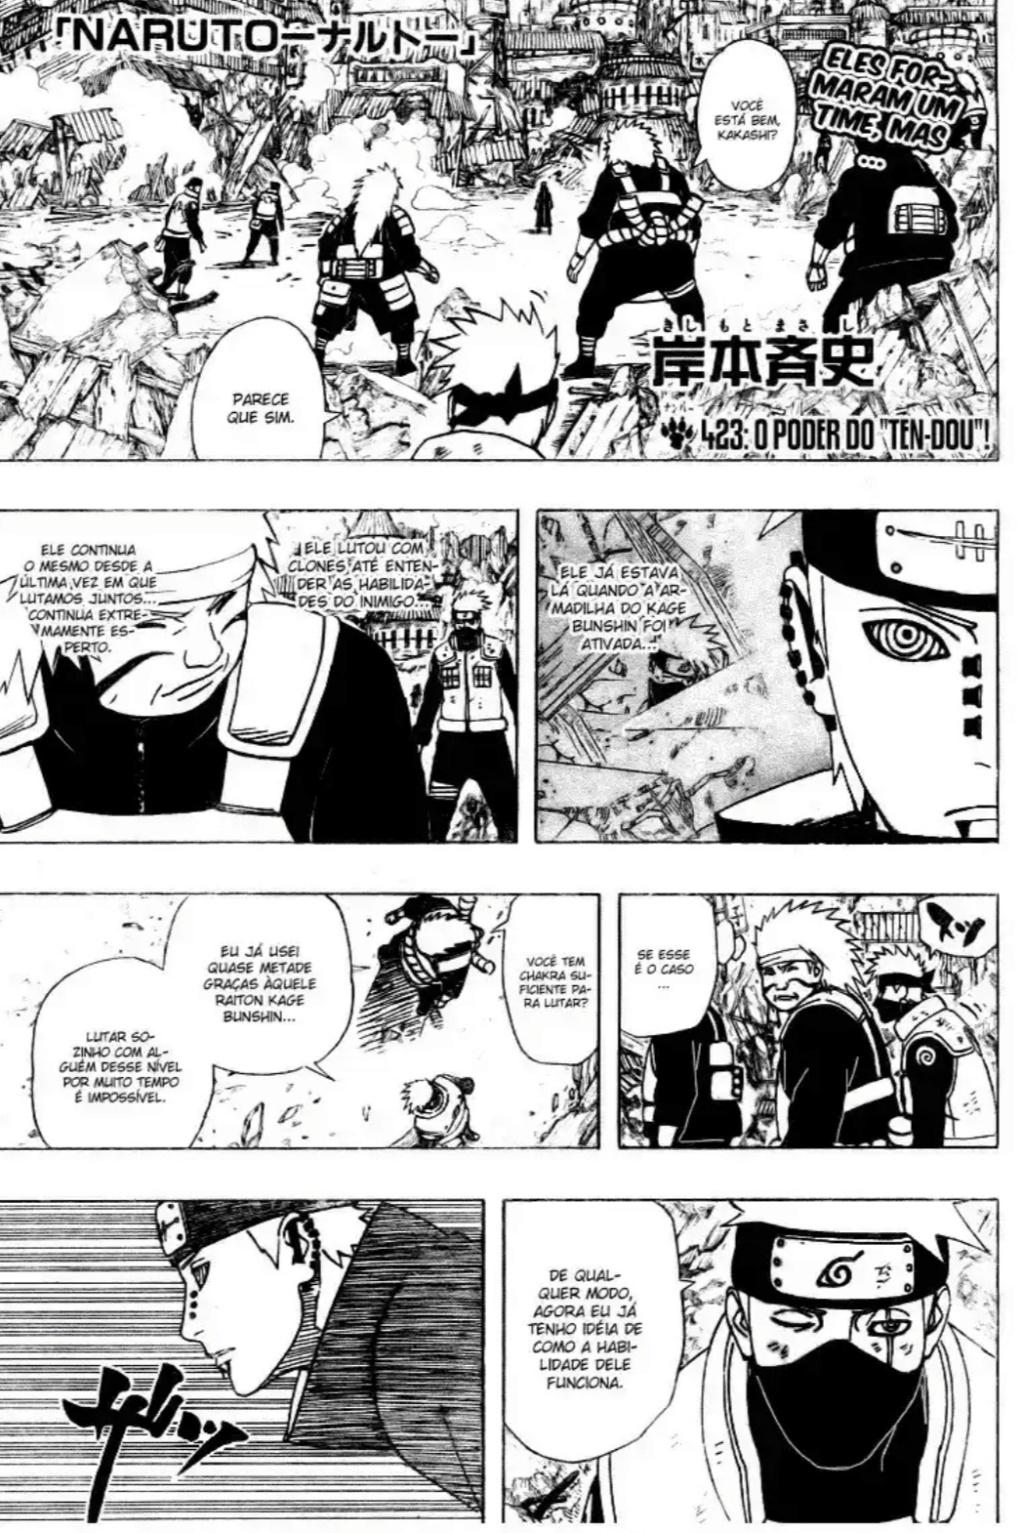 Kakashi MS(Guerra) VS Itachi(Vivo) - Página 4 Img_2288